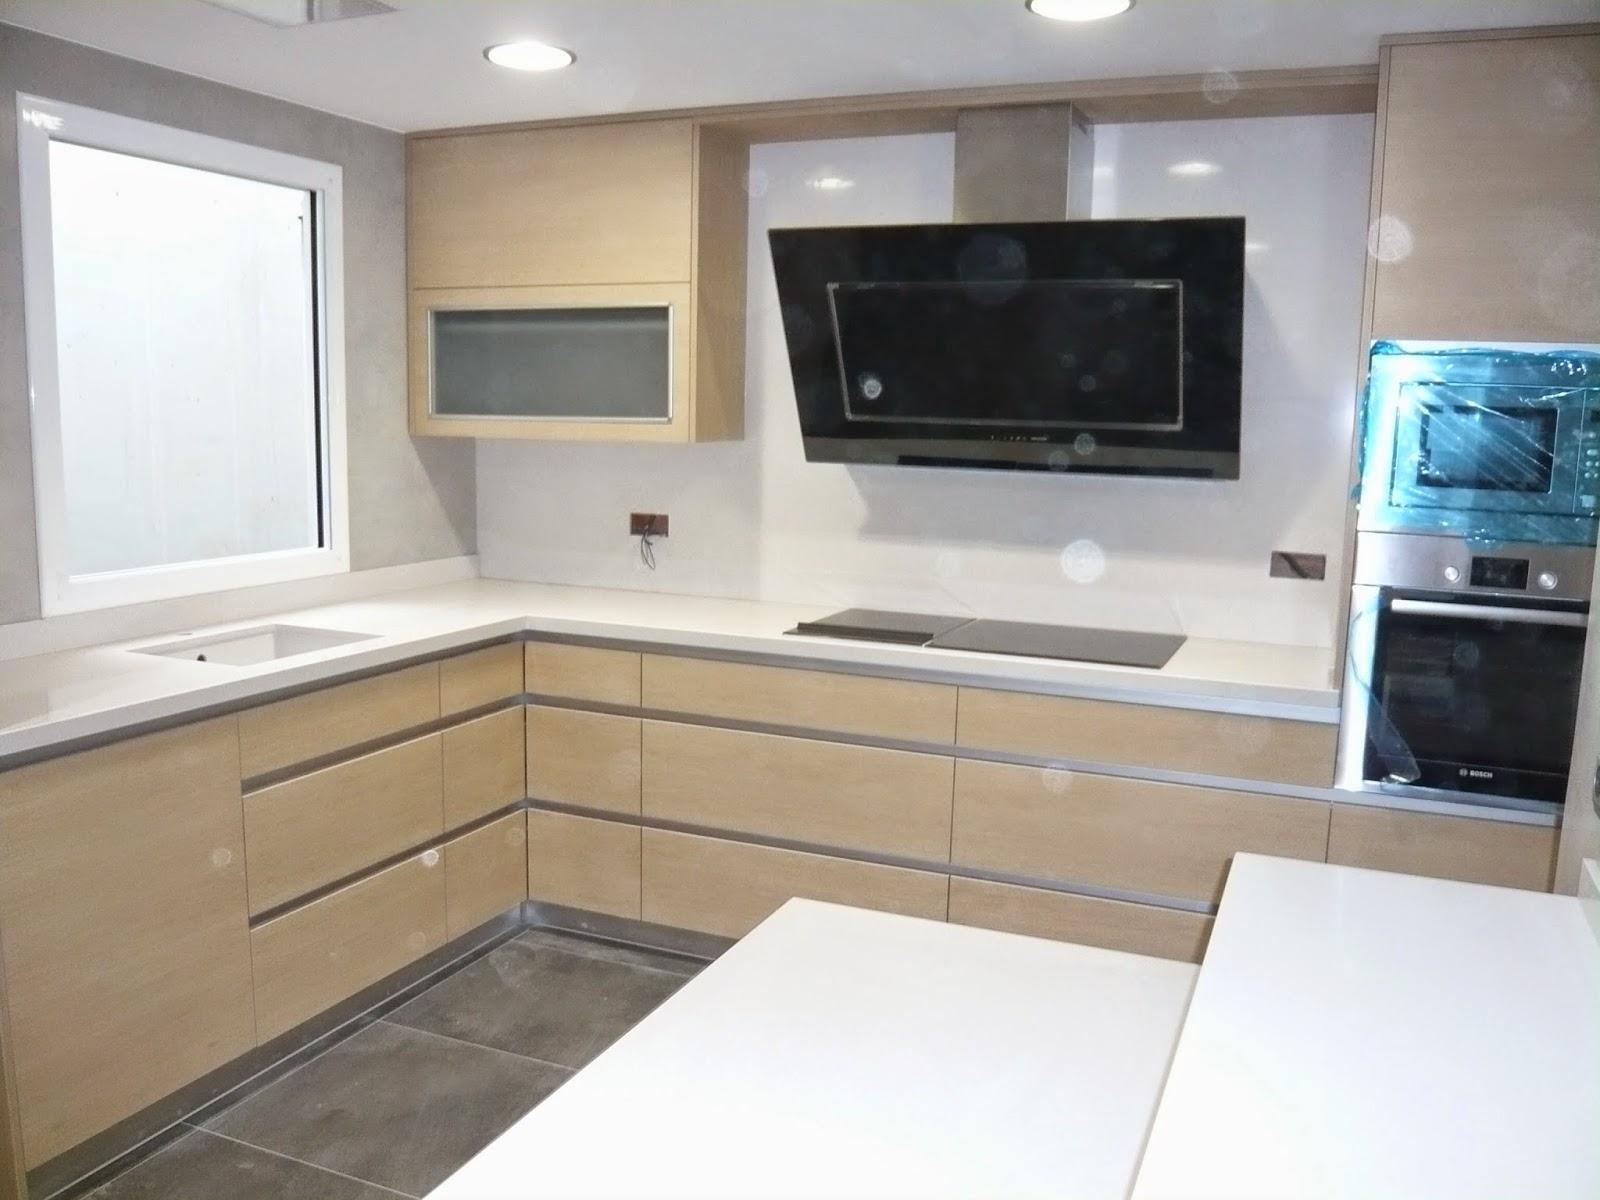 Reuscuina muebles de cocina sin tiradores gola - Tiradores y pomos para muebles ...